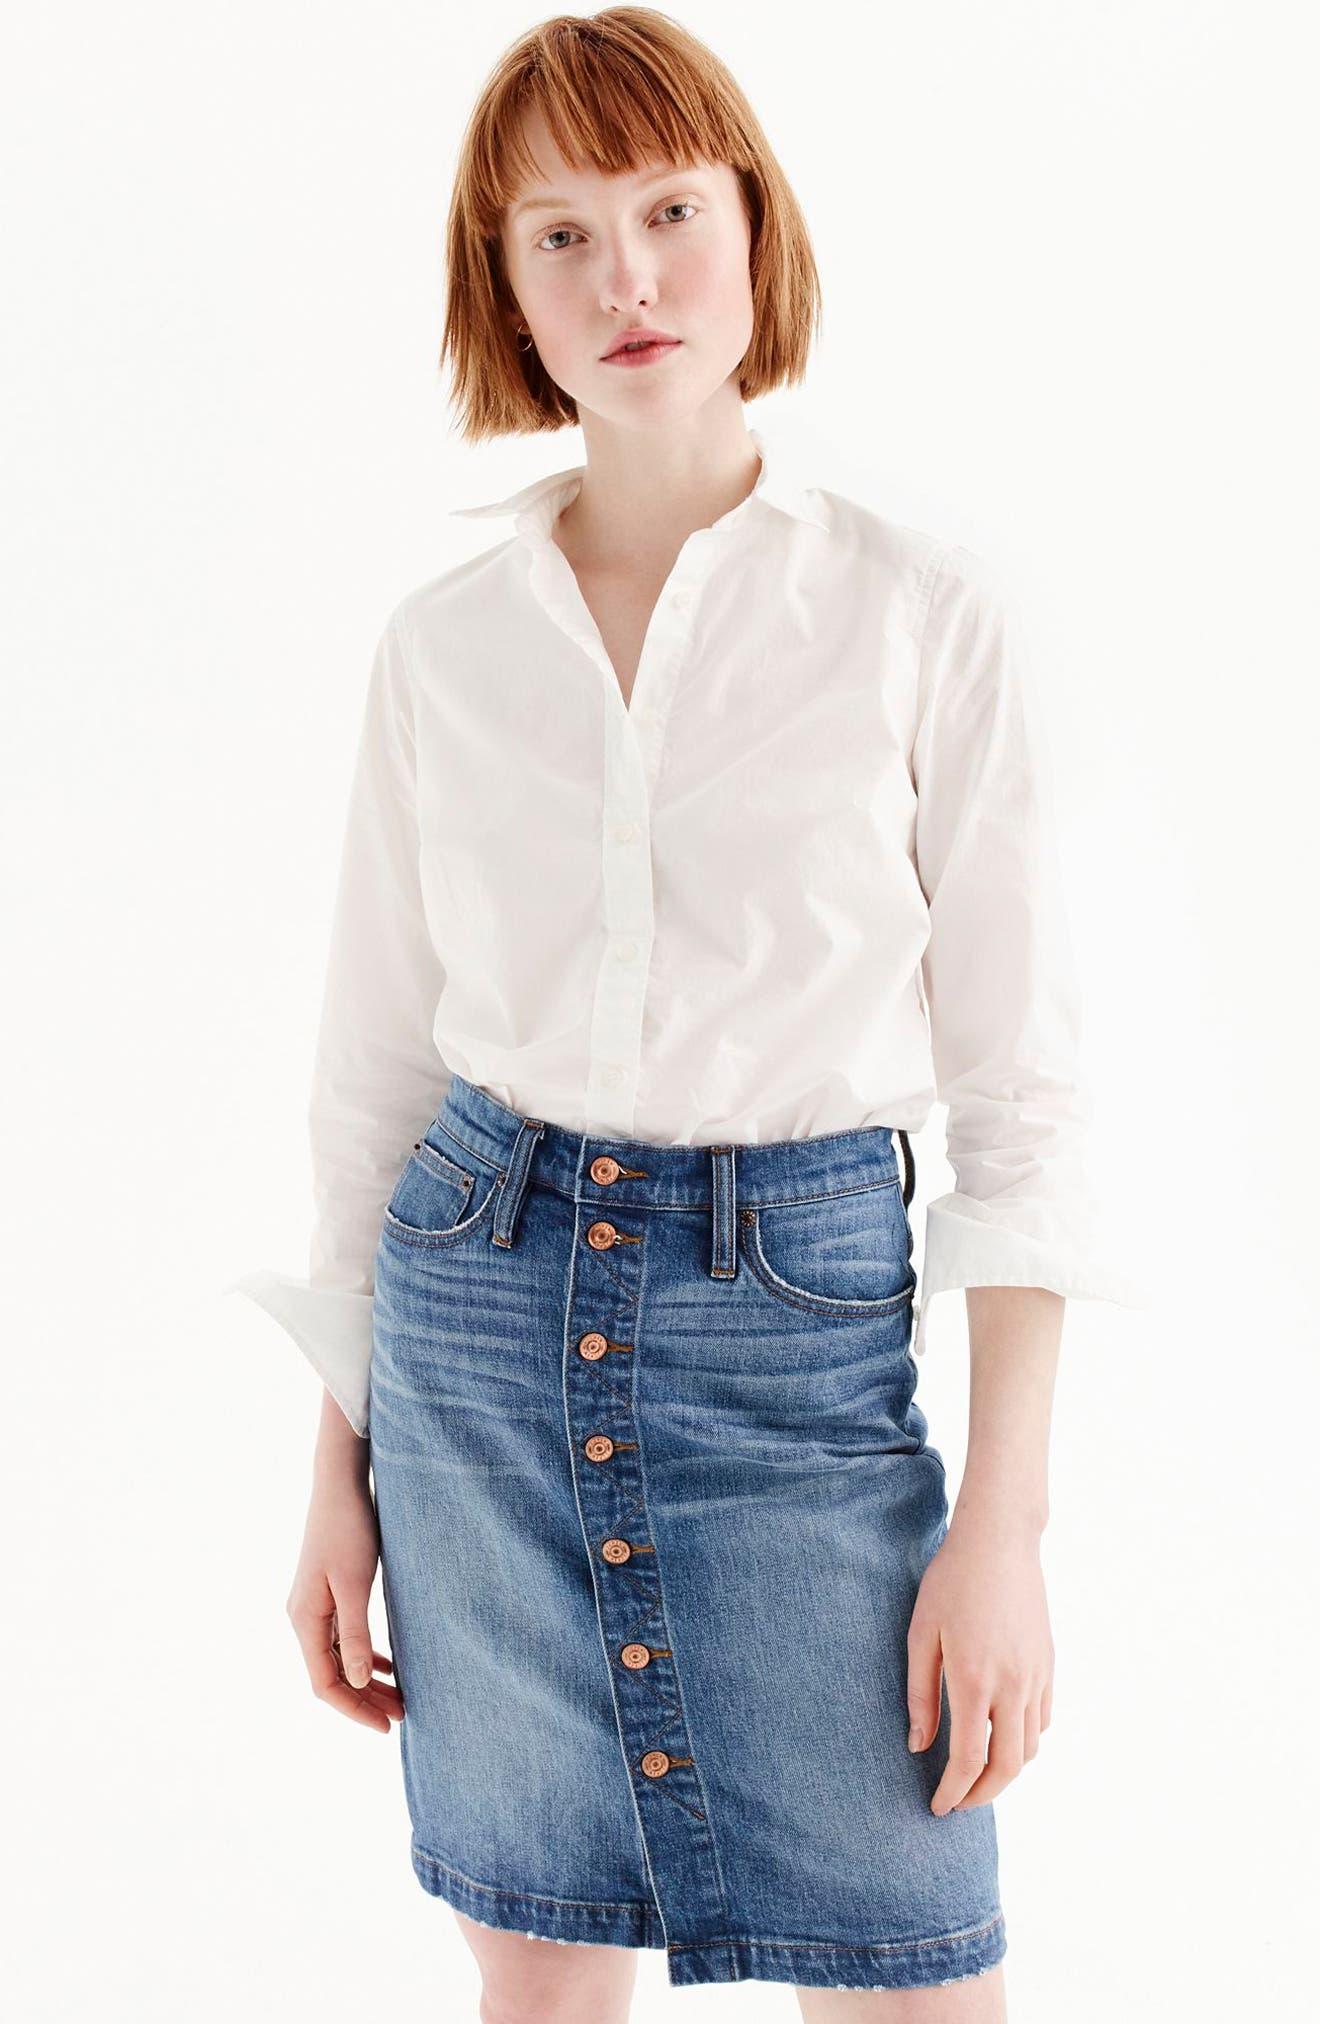 J.Crew New Perfect Cotton Poplin Shirt,                         Main,                         color, White